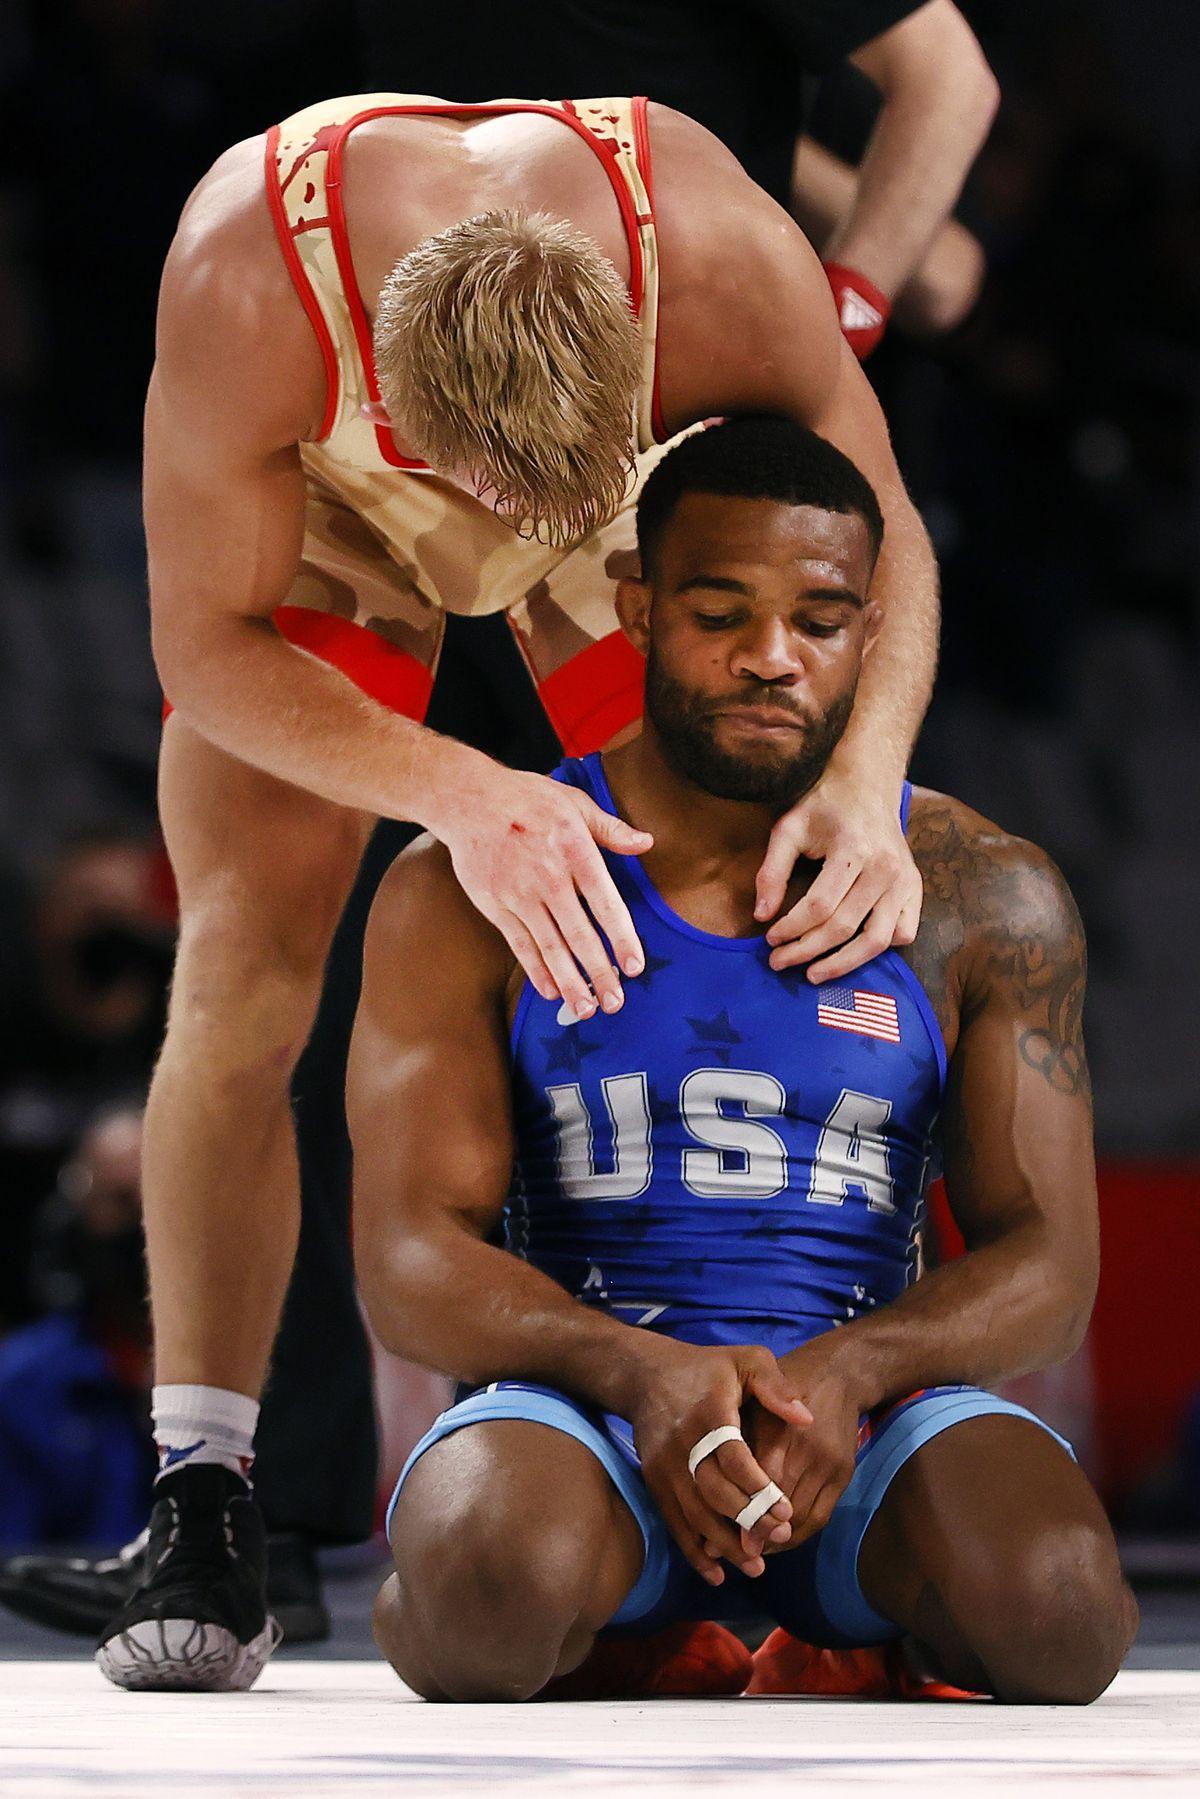 U.S. Olympic Team Trials - Wrestling